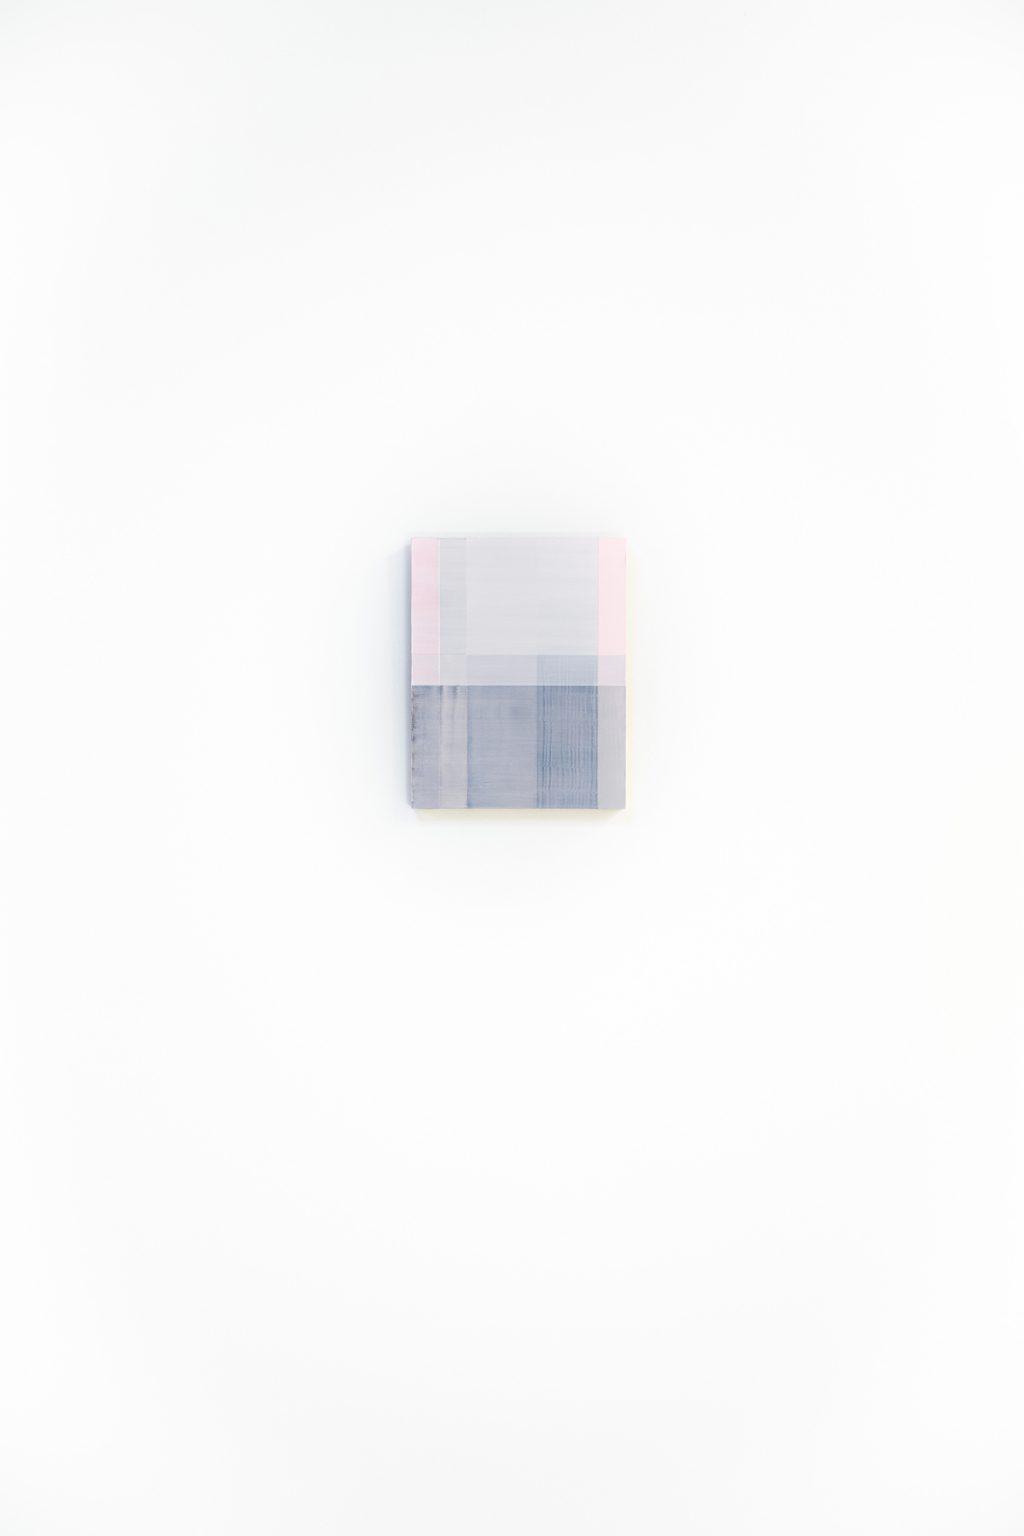 untitled #06-2020